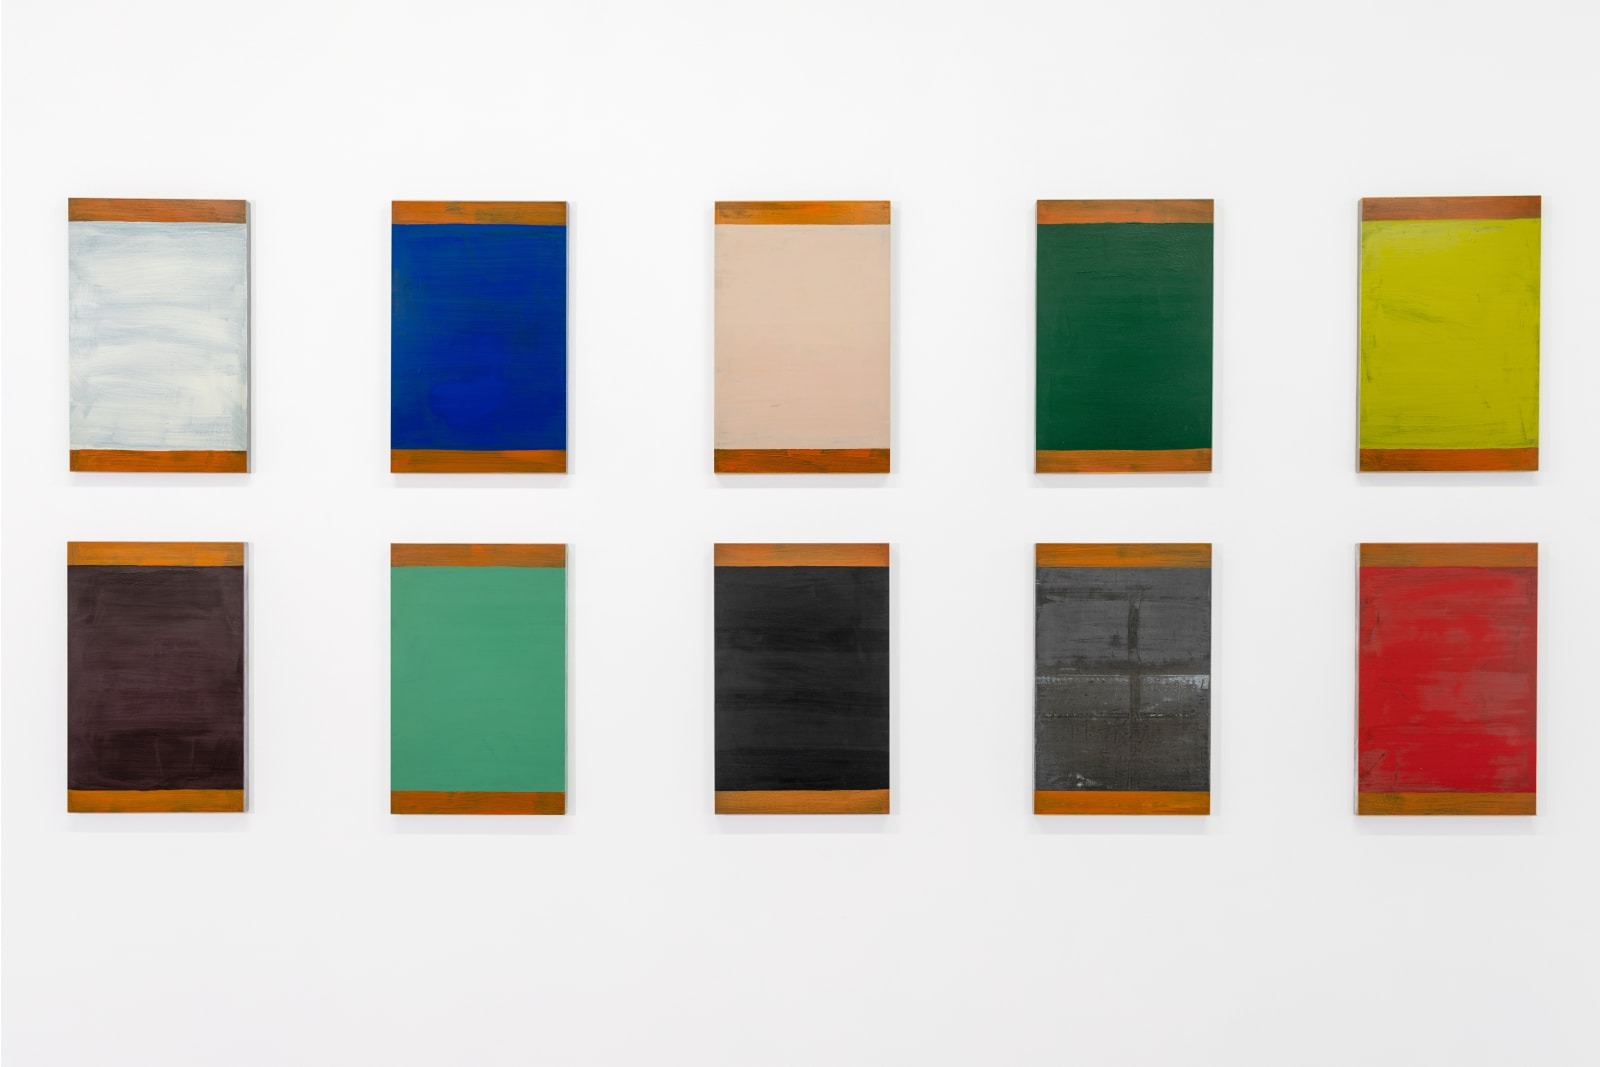 'Untitled' 《無題》, 1986